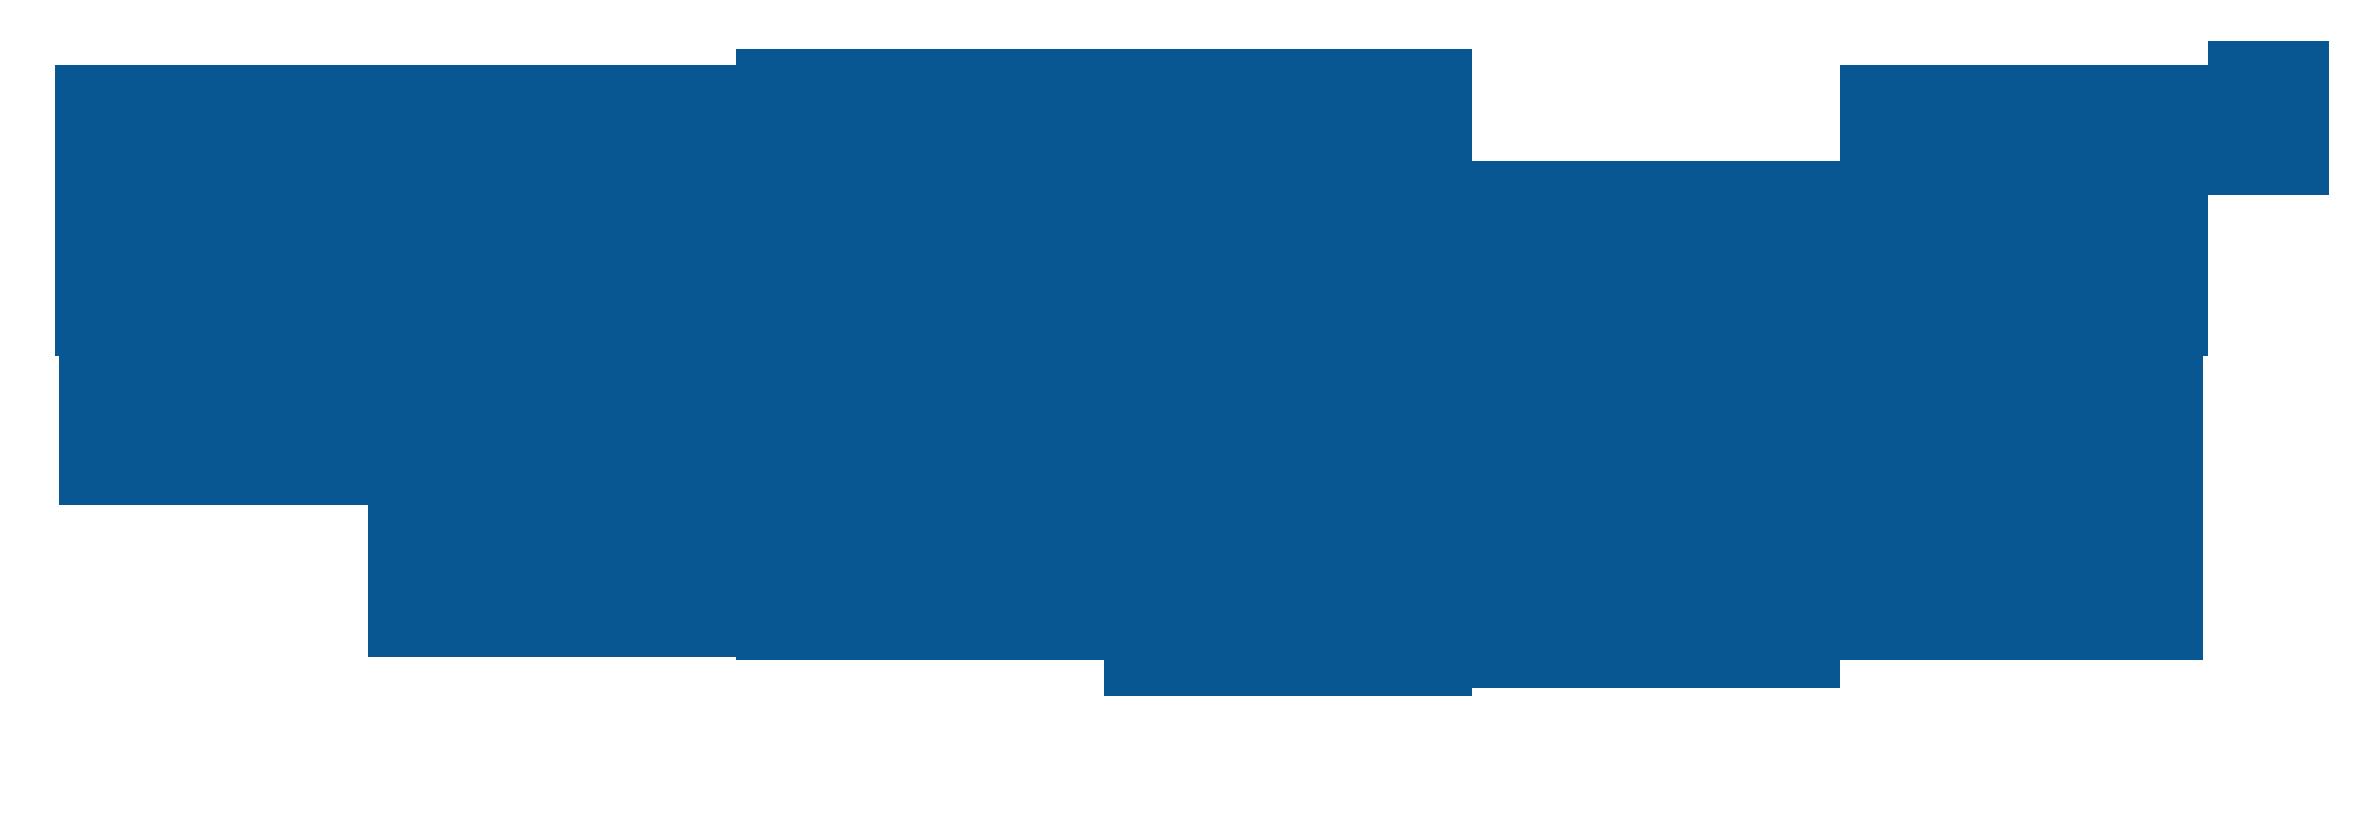 niasa logo.png